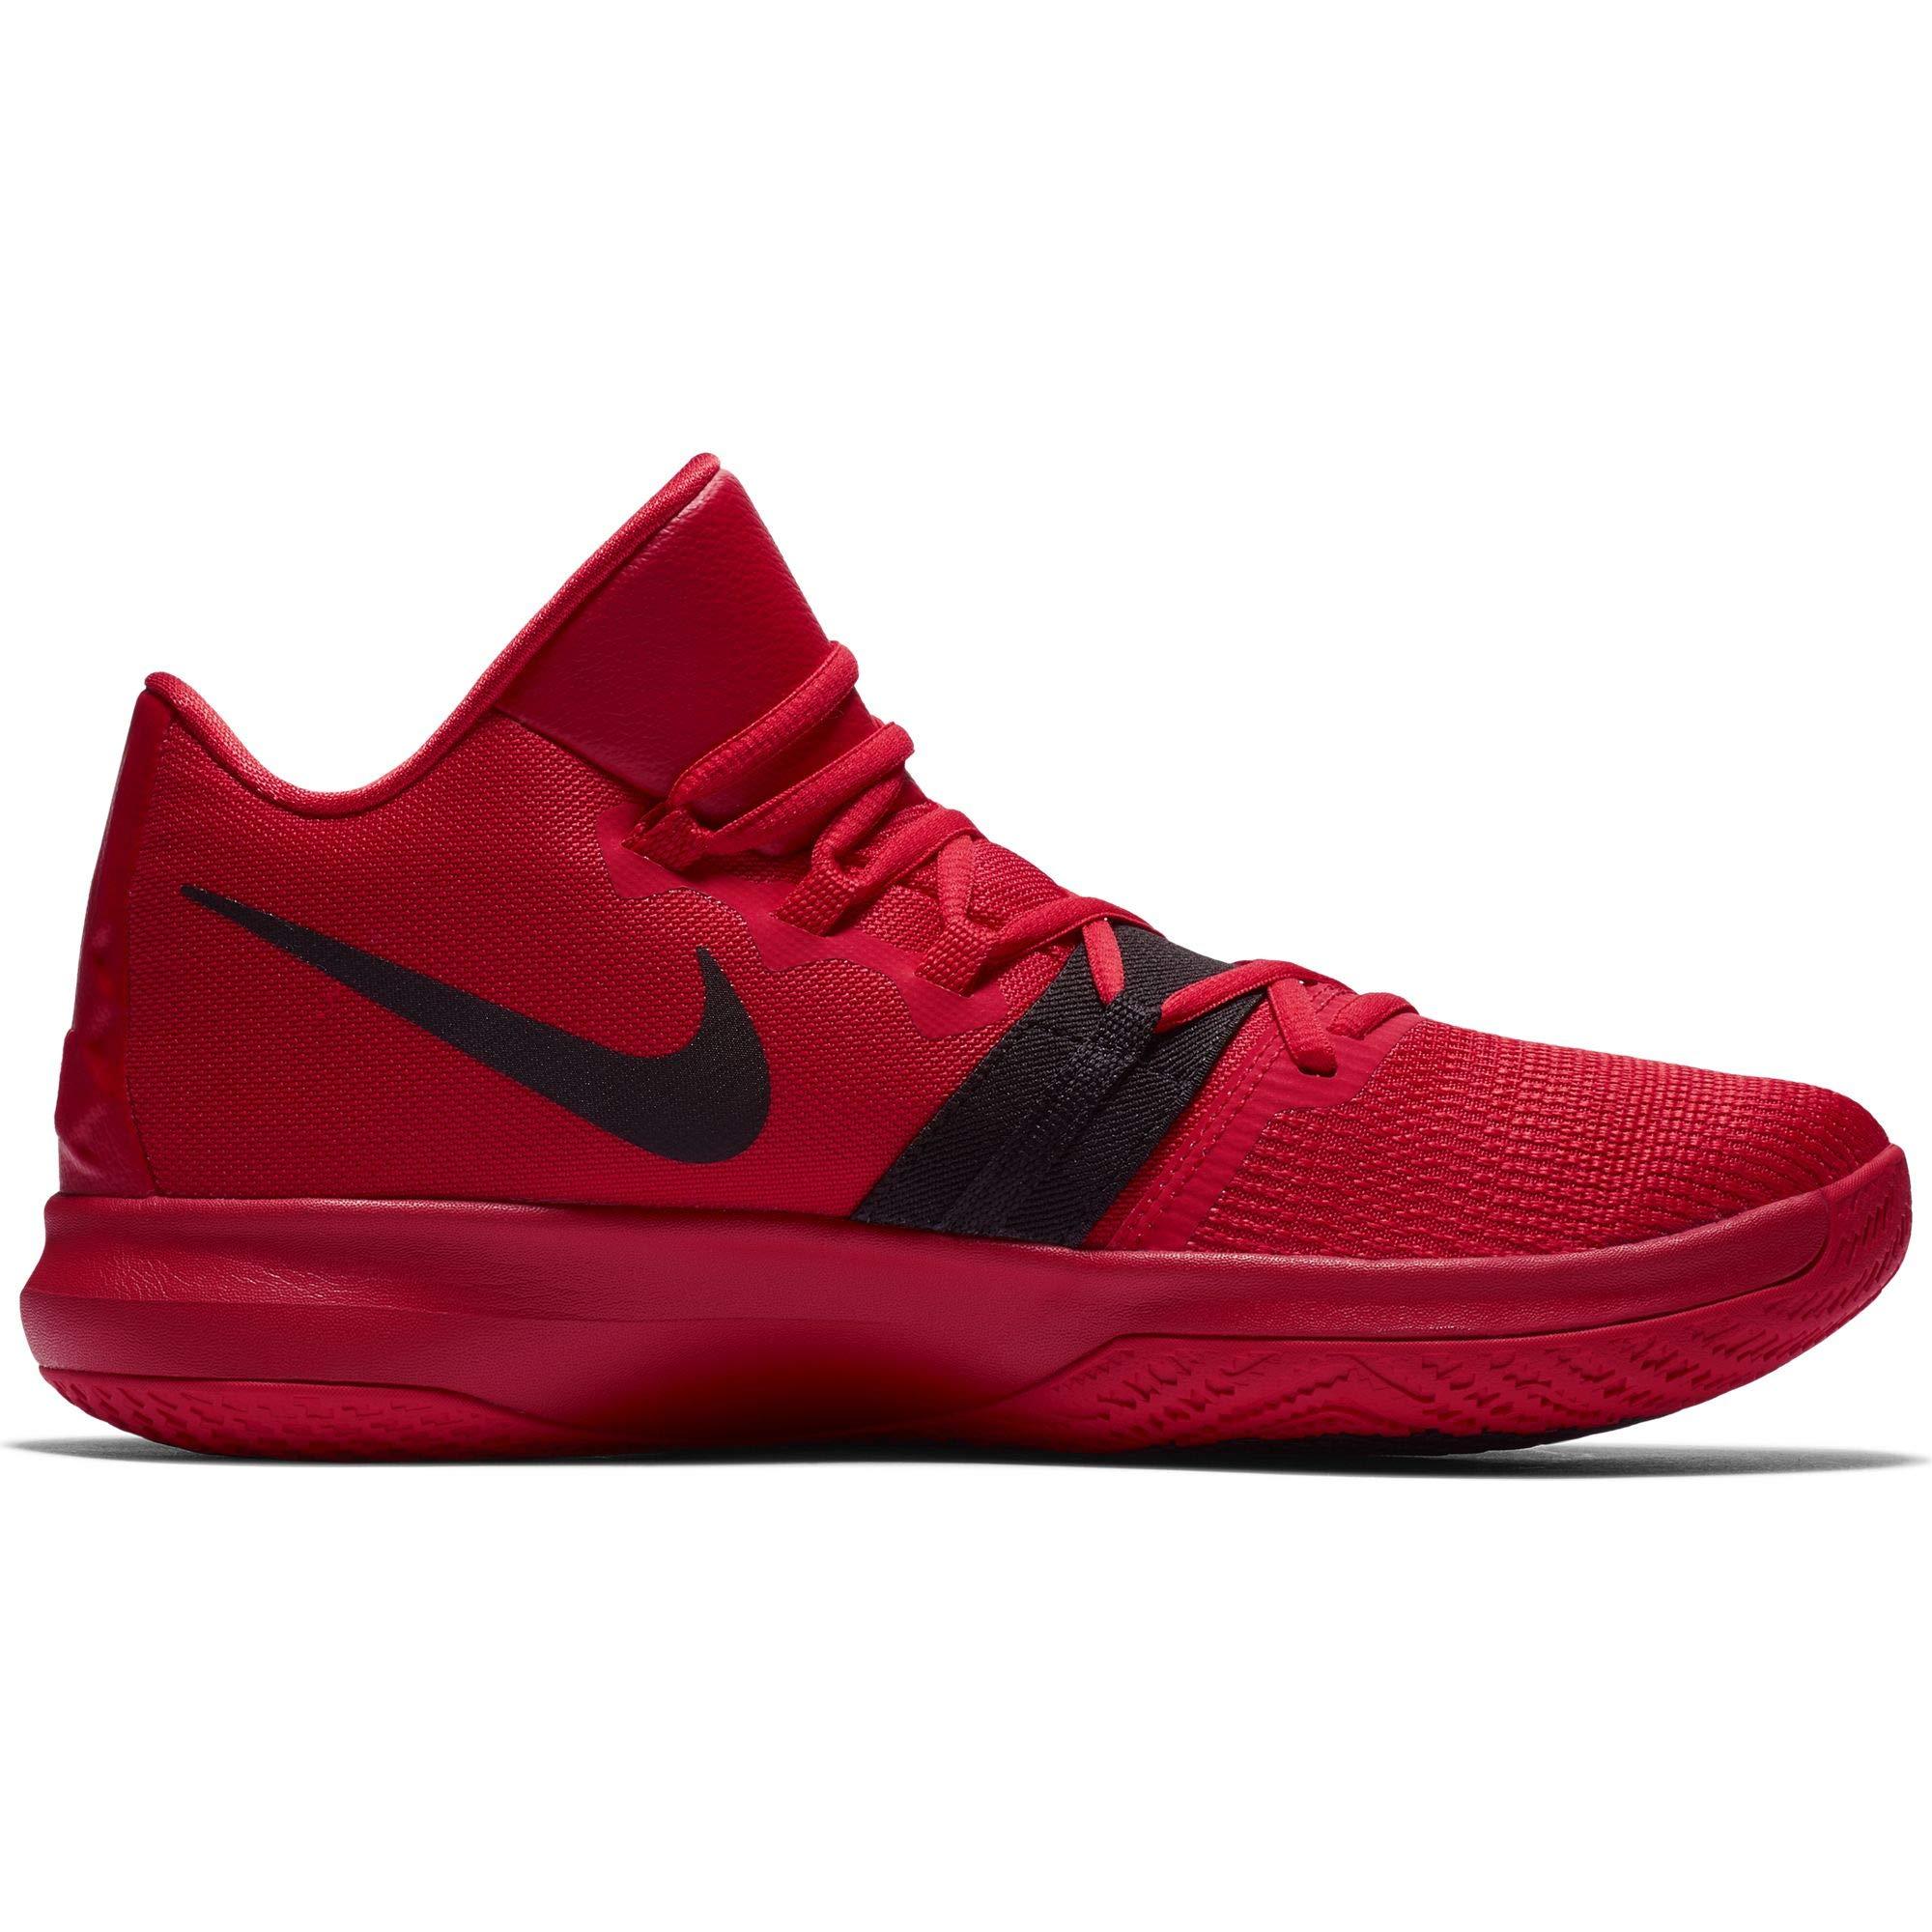 f5022518bb07f Nike Men's Kyrie Flytrap University Red/Metallic Gold/Black Size 12 M US